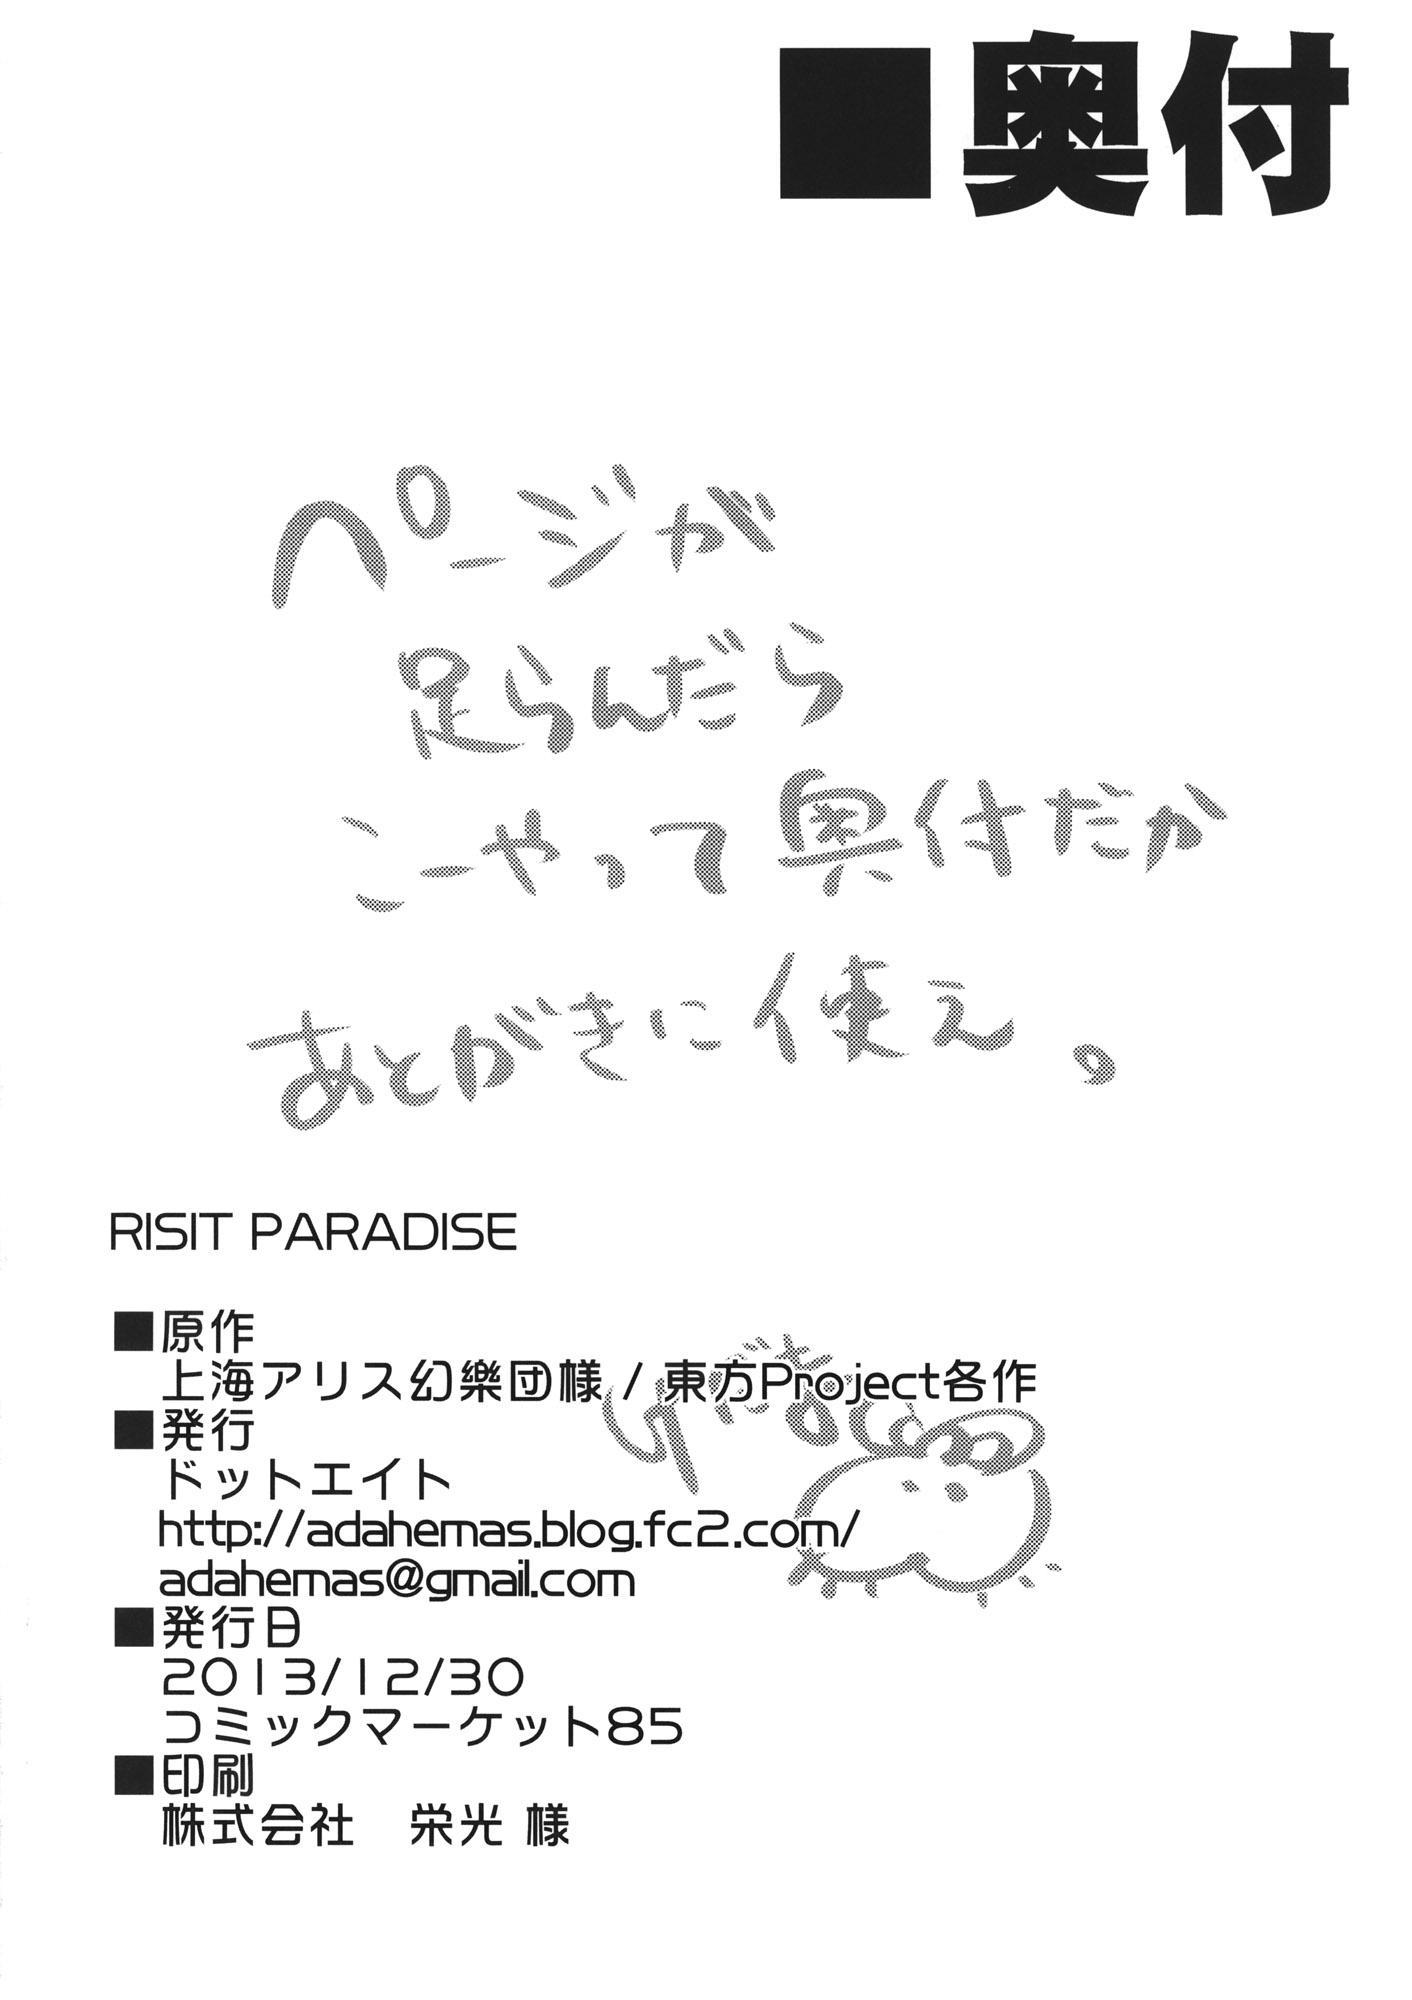 RESIT PARADISE Tsuugakuro de, Tsukamaeta. 2 20